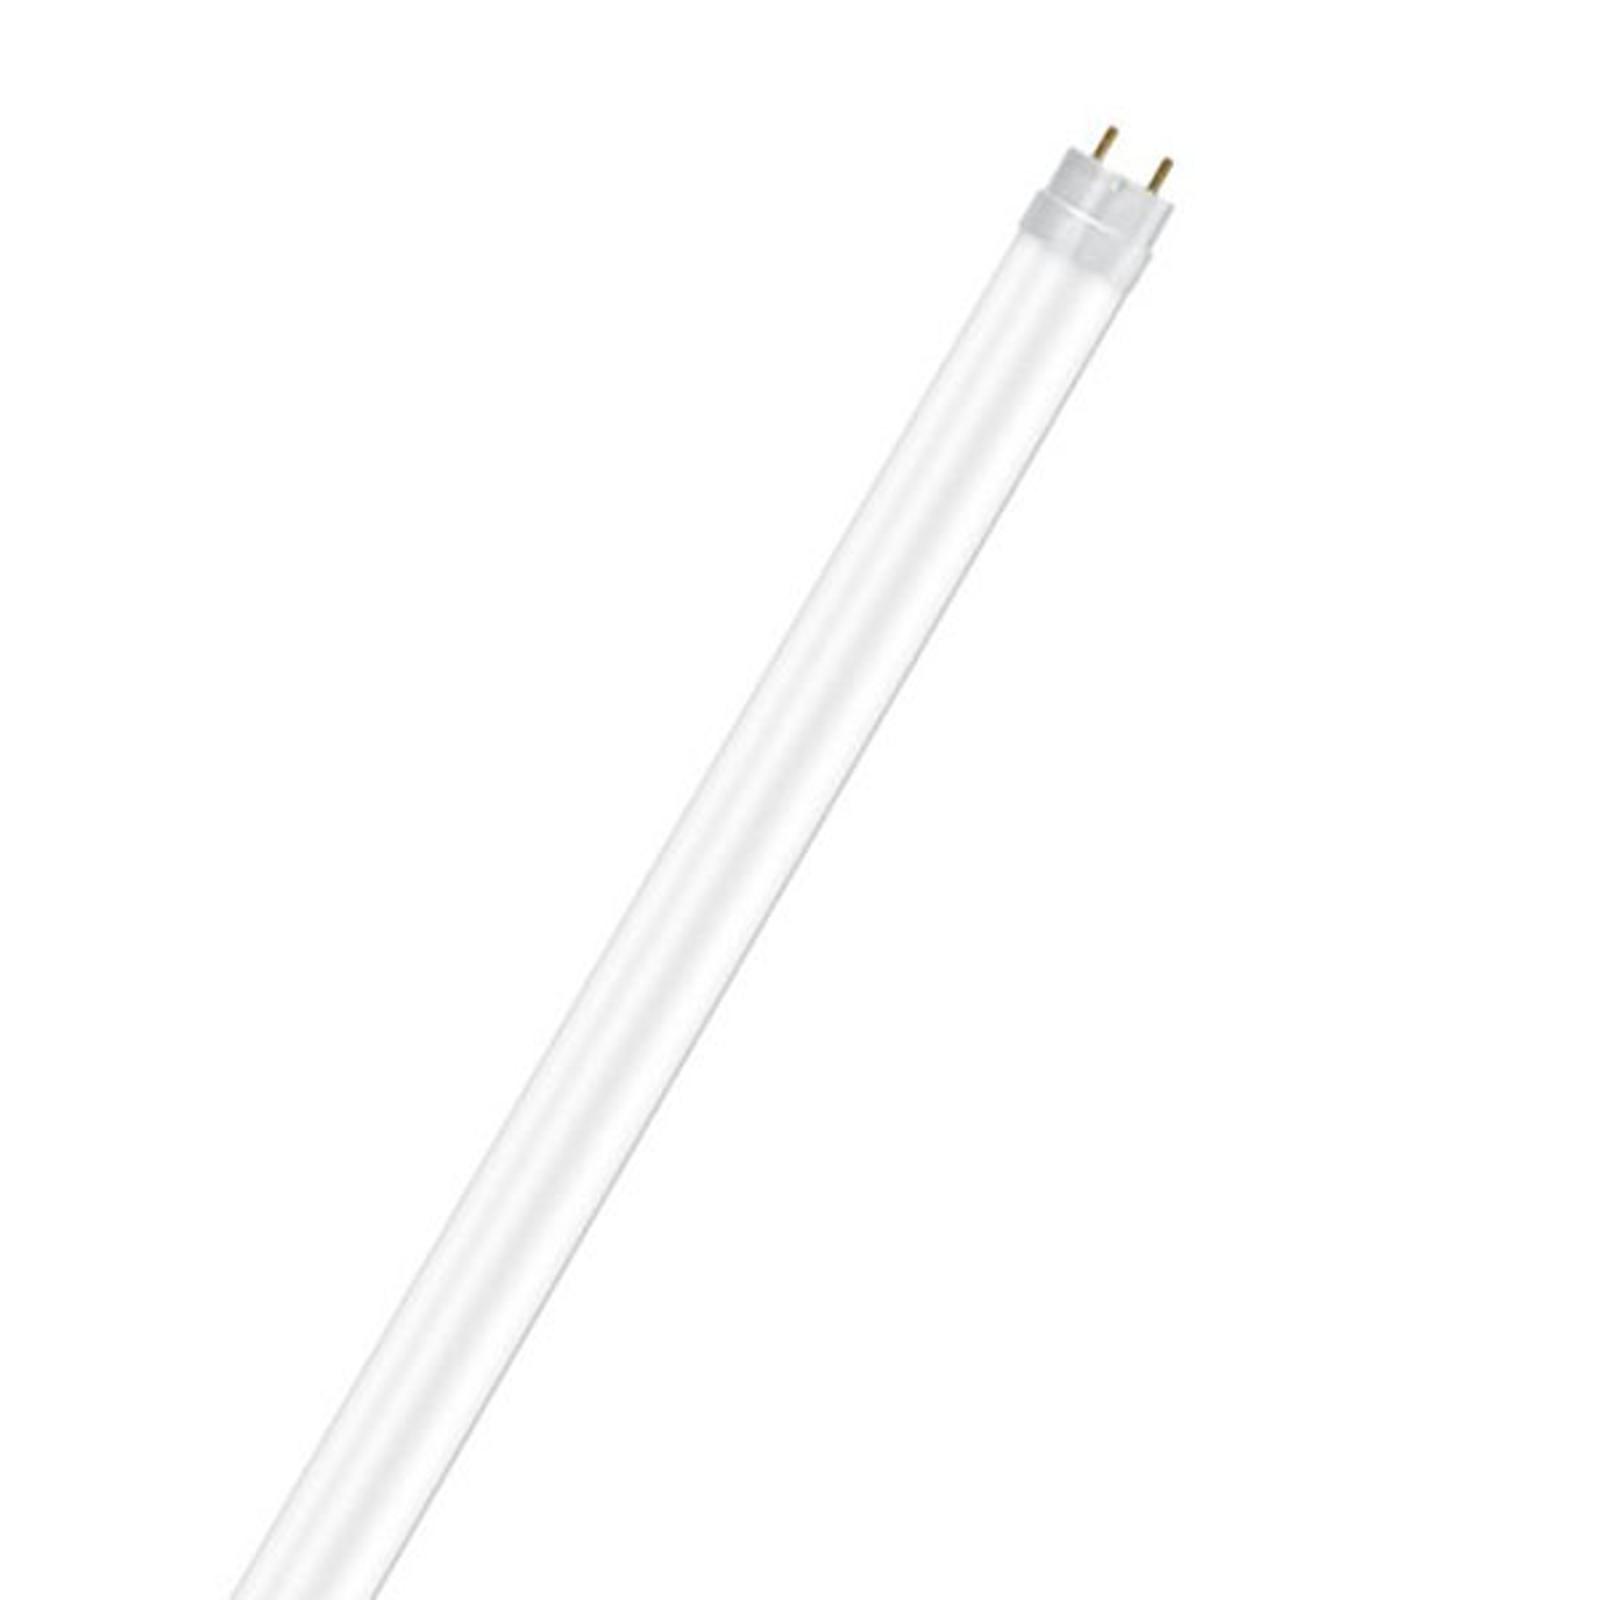 OSRAM-LED-putki G13 60cm SubstiTUBE 7,3W 3 000 K